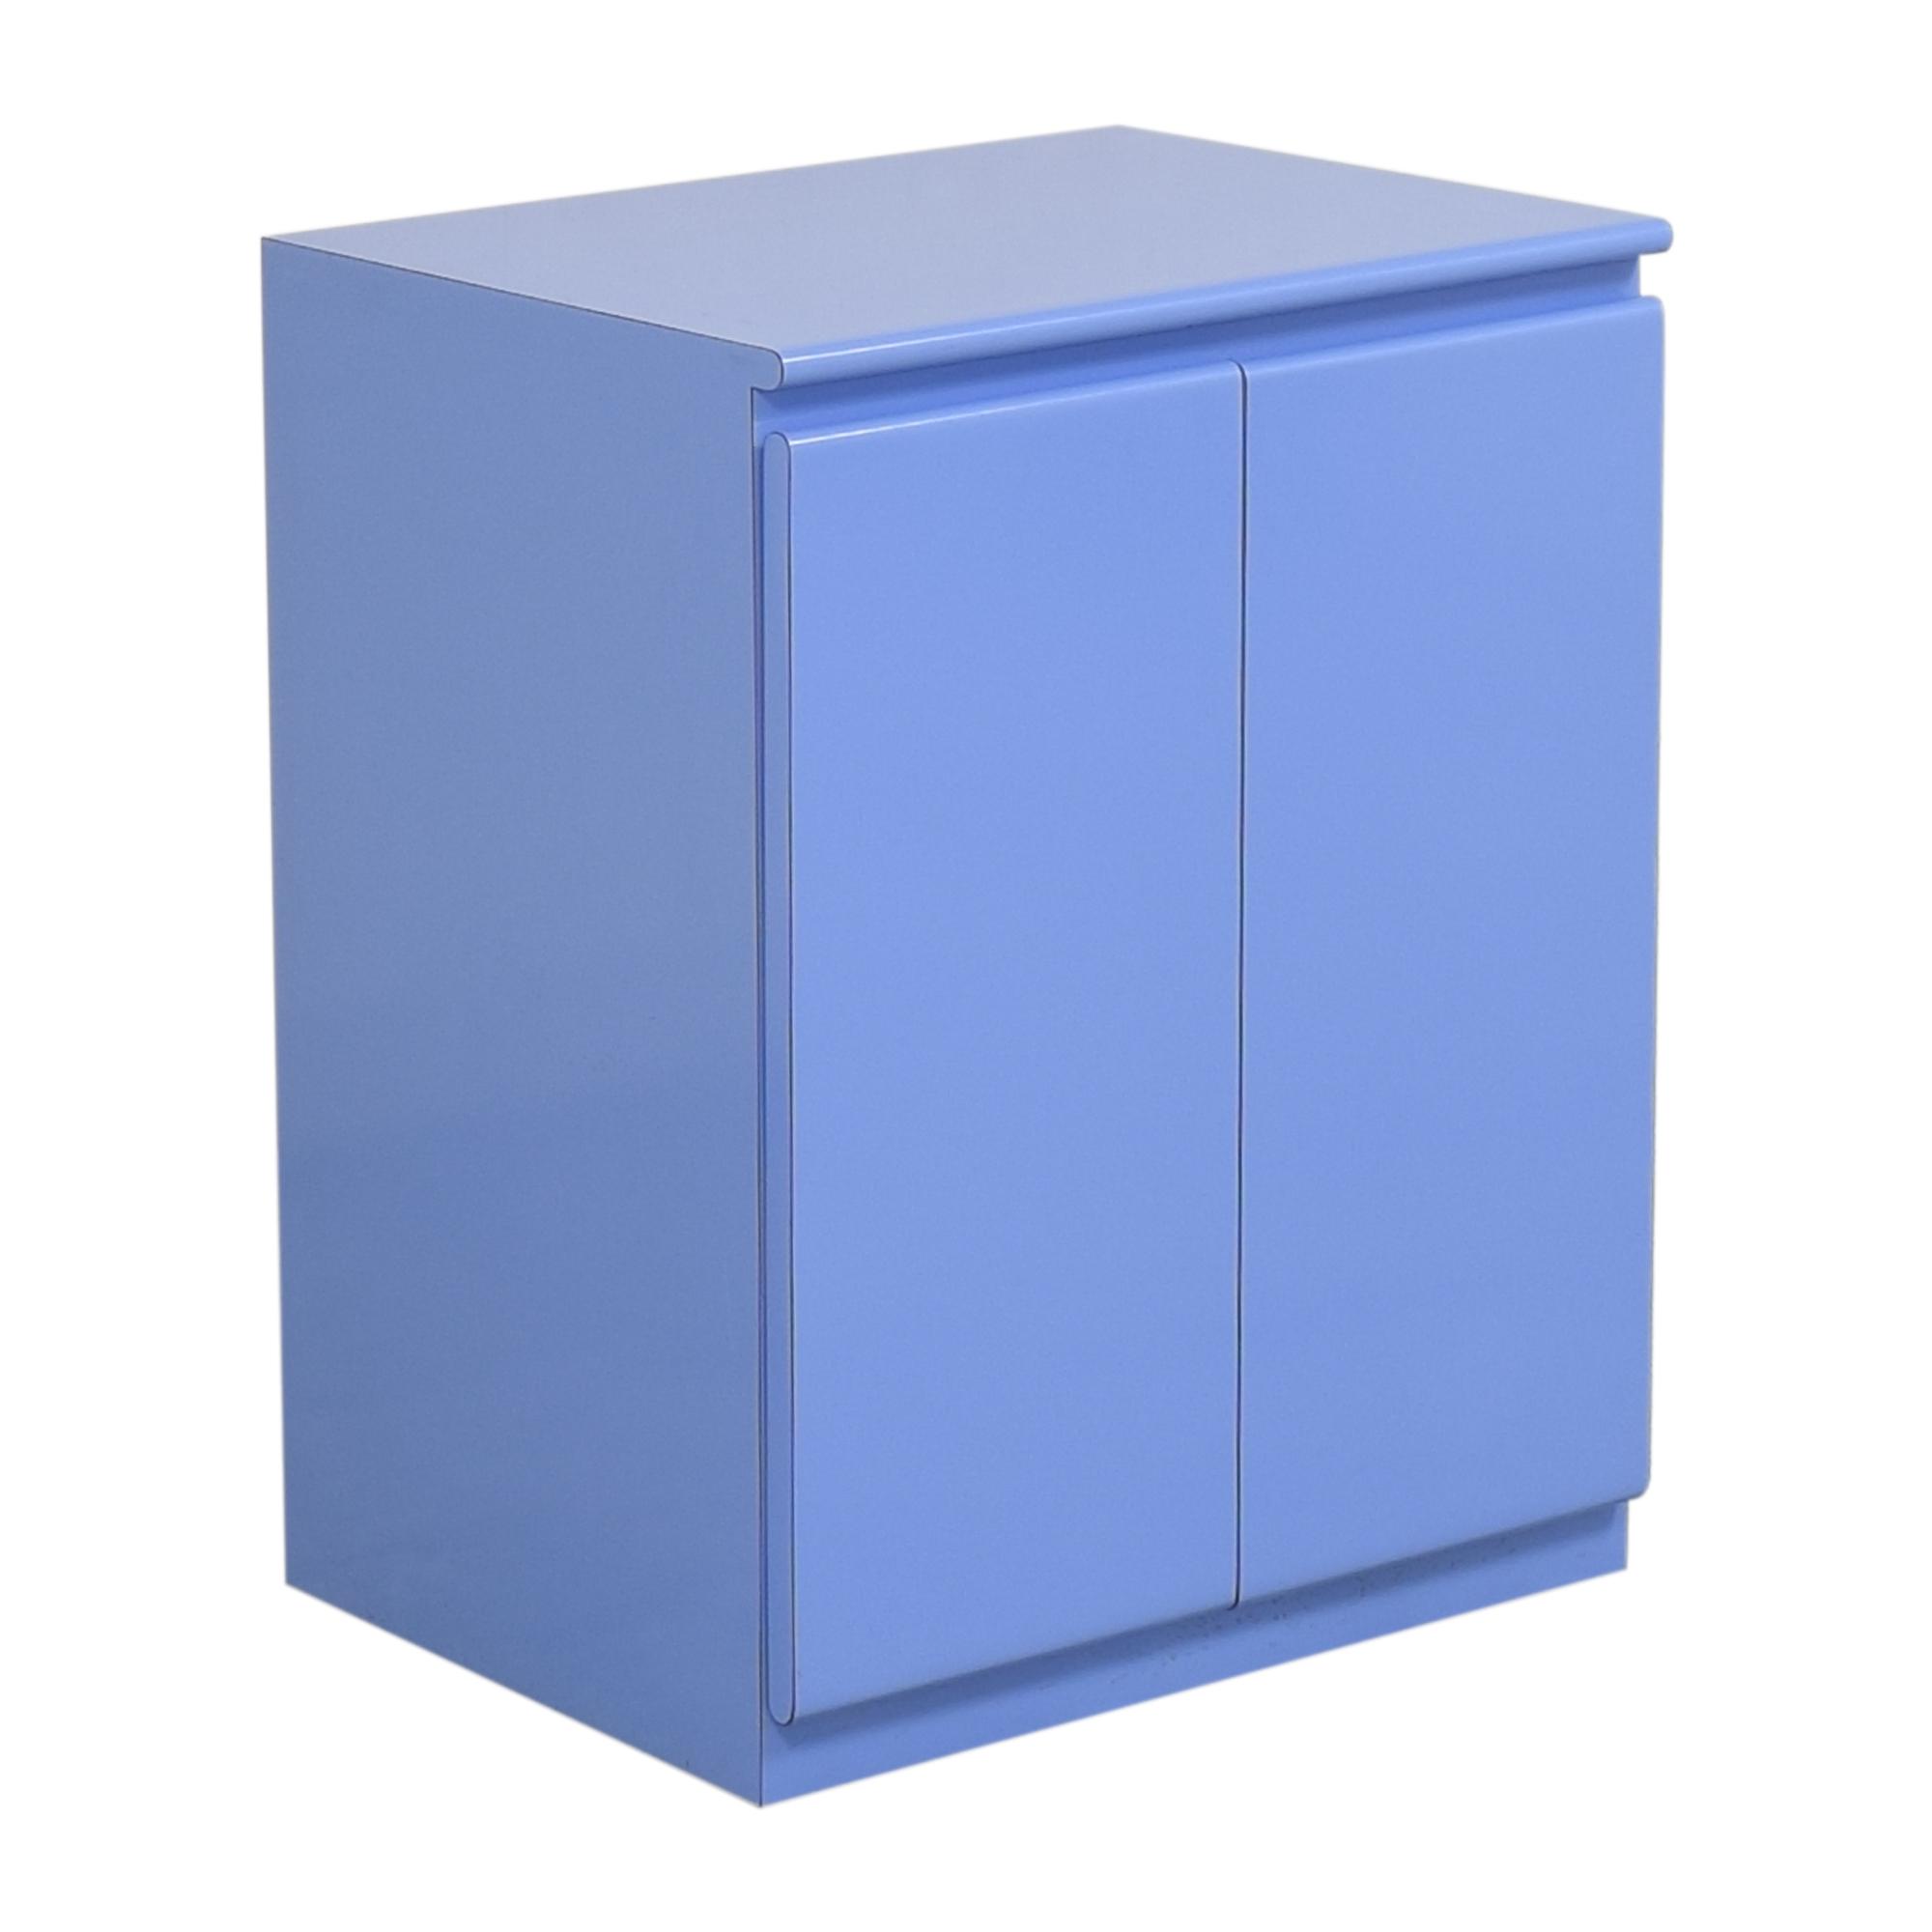 Benson's Custom Furniture Benson's Custom Furniture Two Door Cabinet for sale